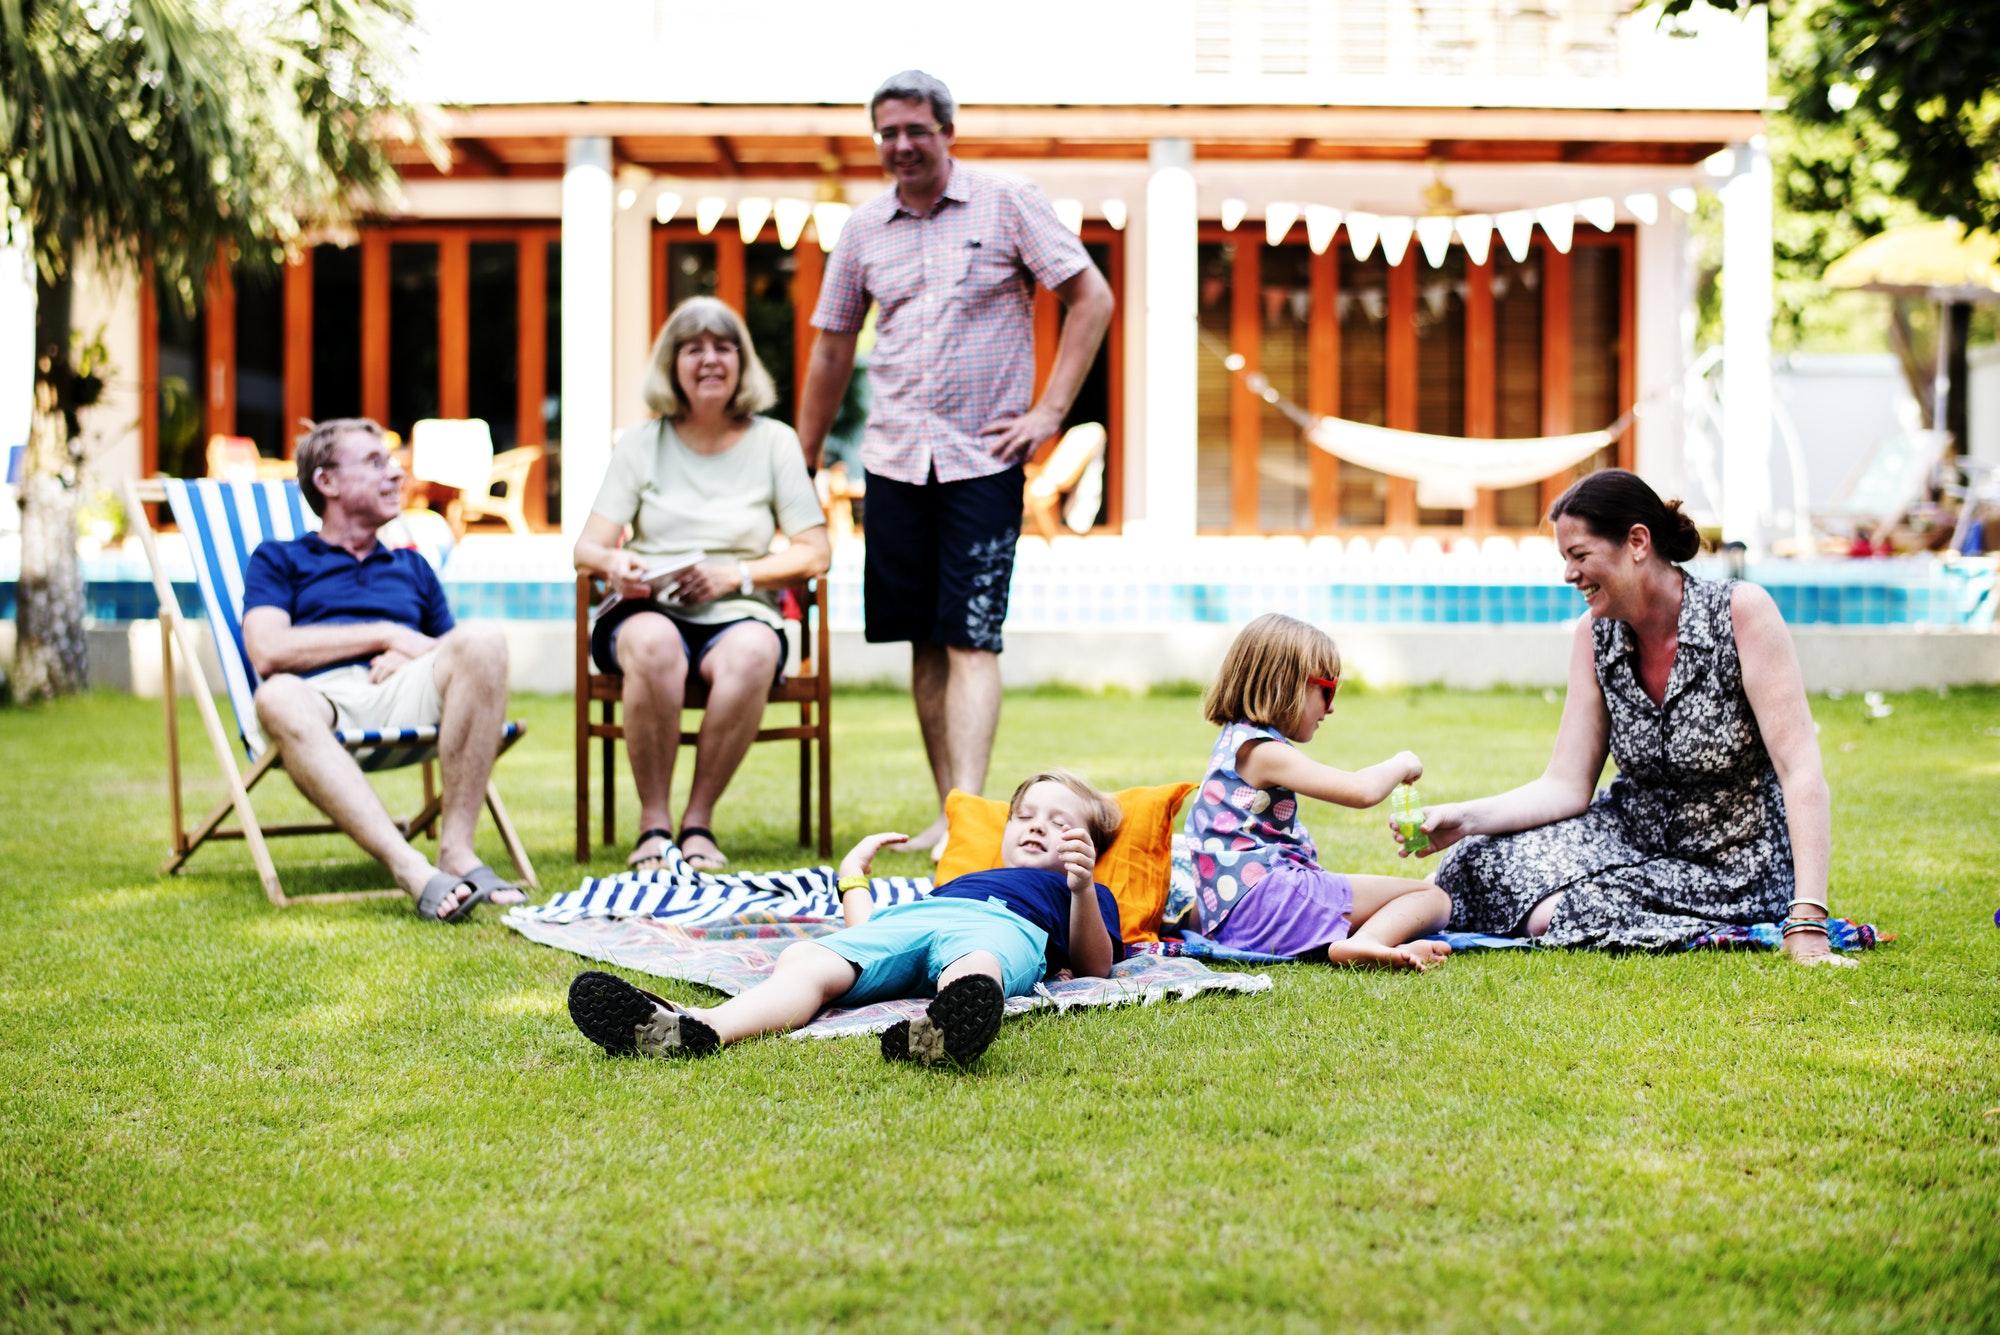 Caucasian family enjoying summer together at backyard